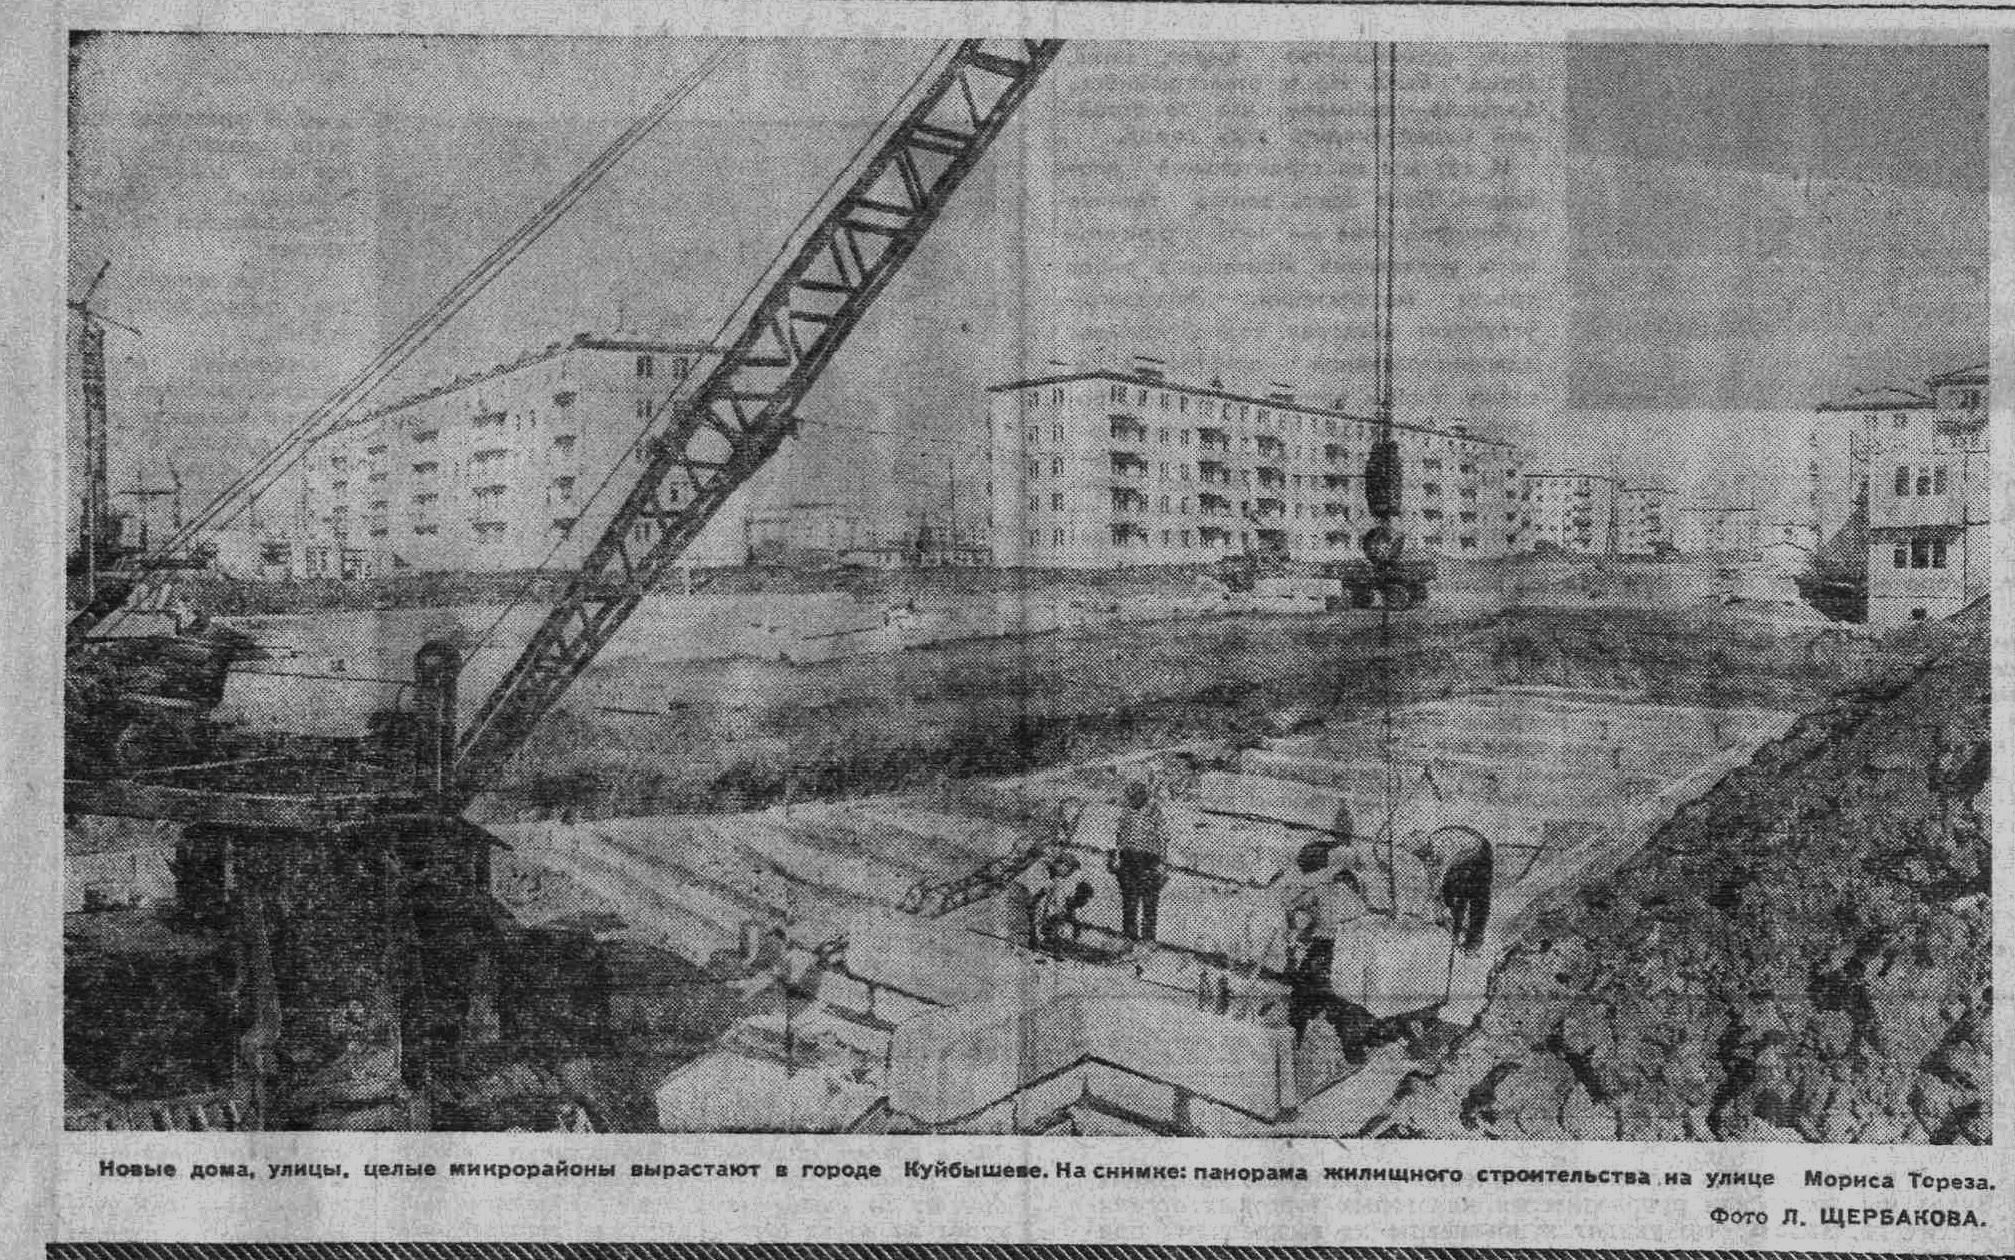 Дзержинская-ФОТО-17-ВКа-1965-09-26-фото с МТ